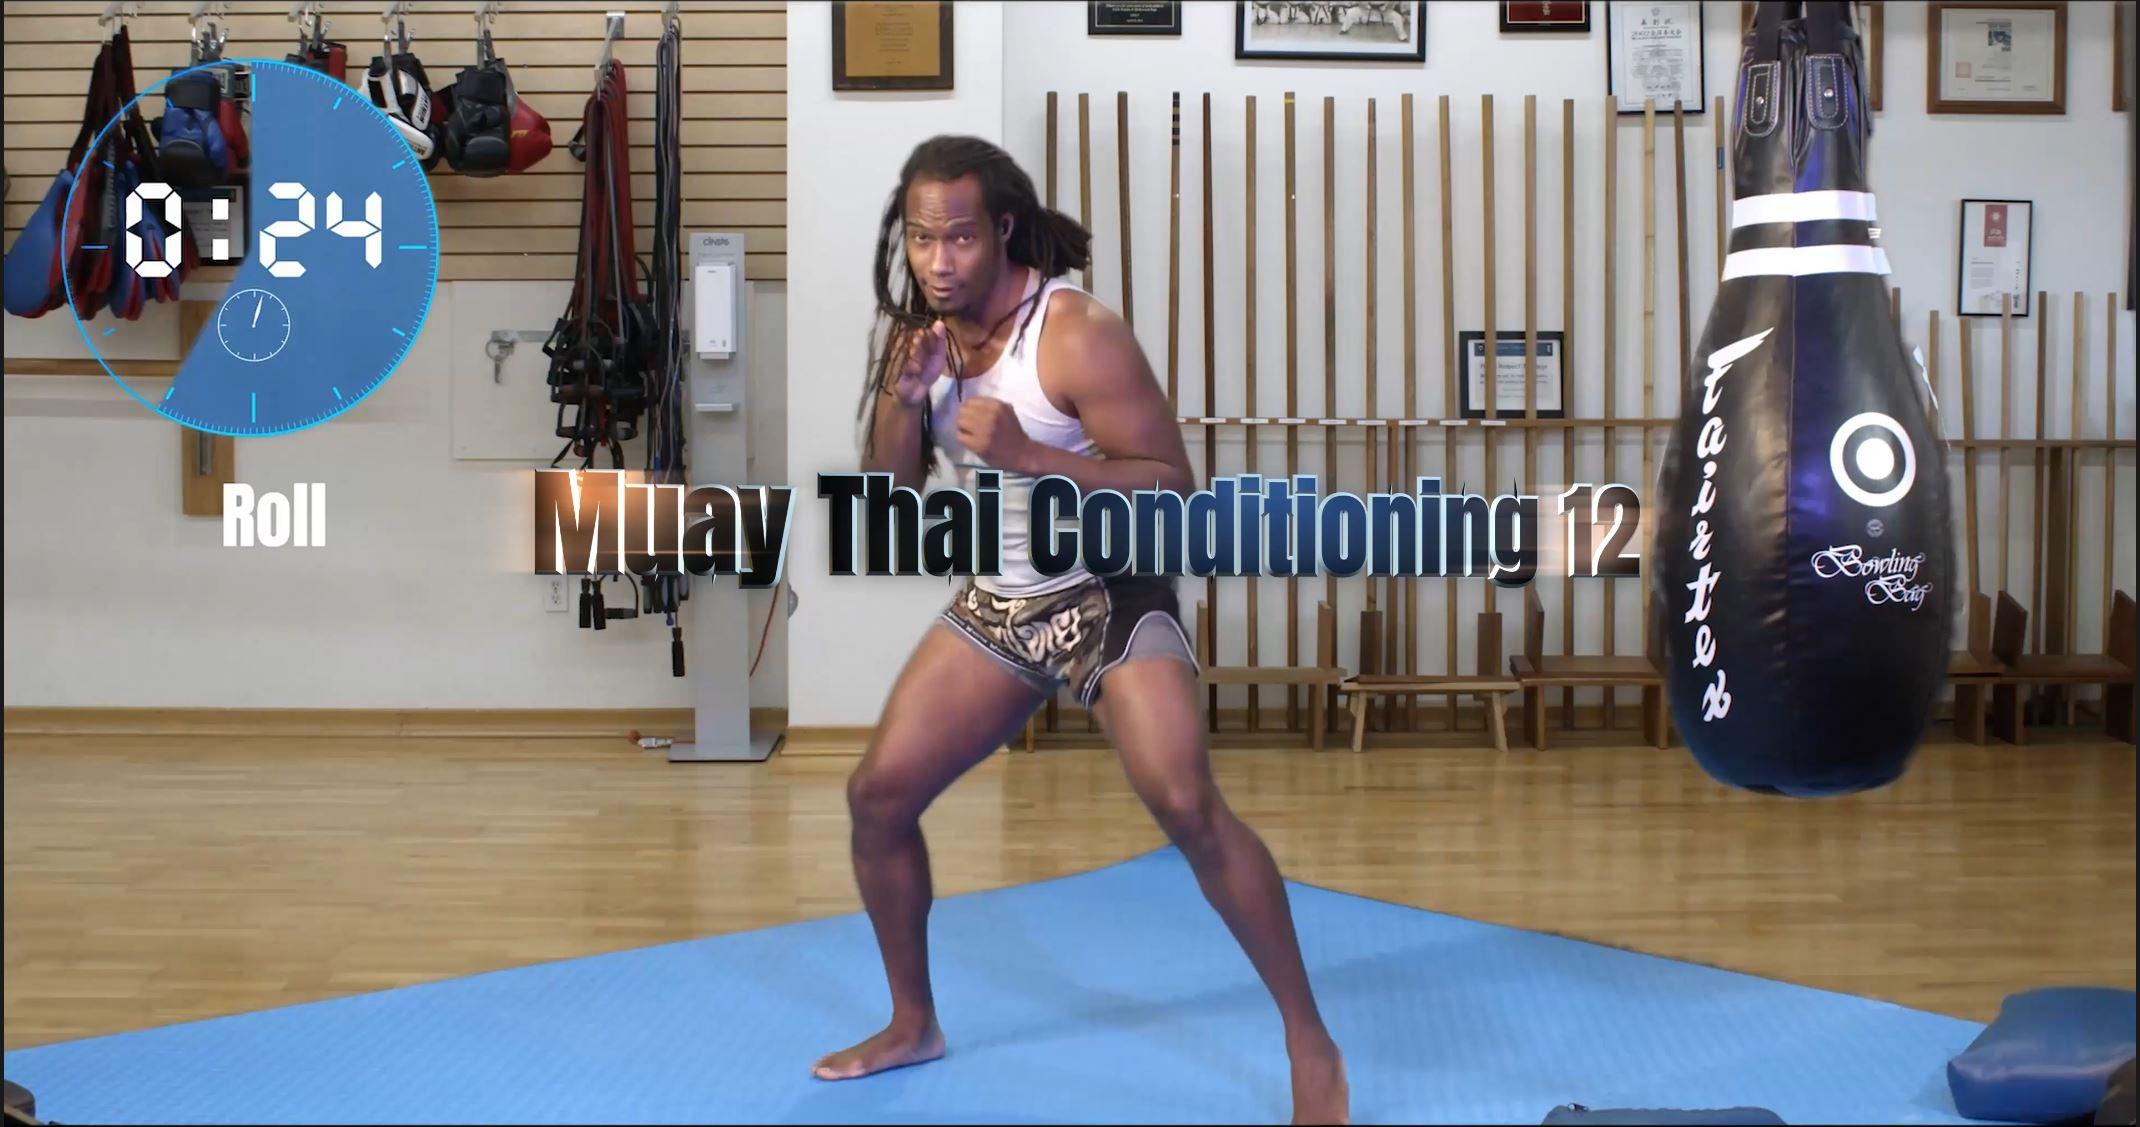 Muay Thai Conditioning 12